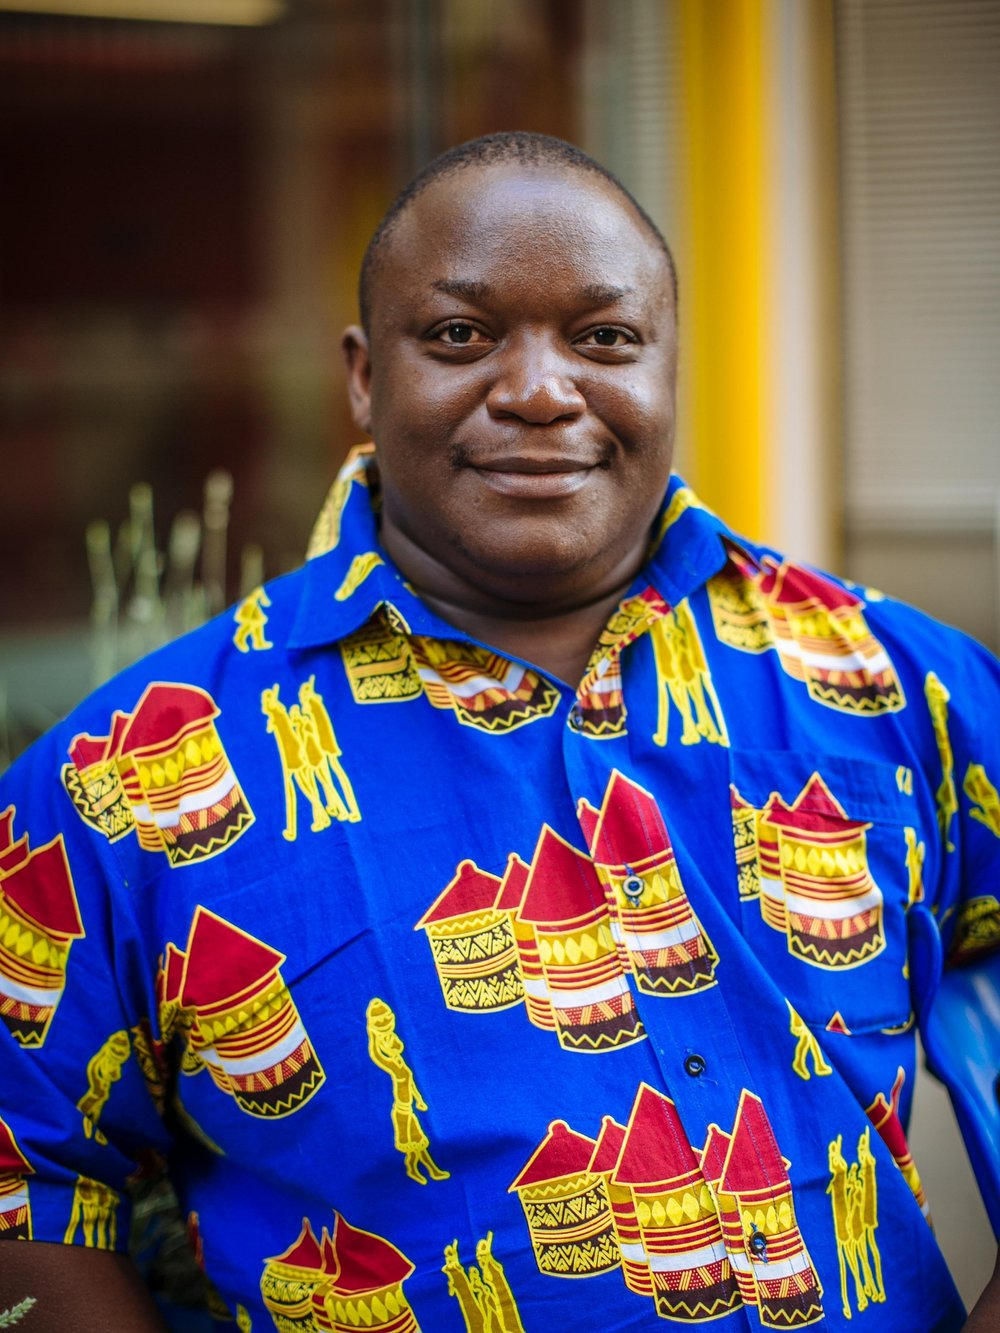 Fred Alucheli - Living in: Nairobi, KenyaNationality: Kenyan